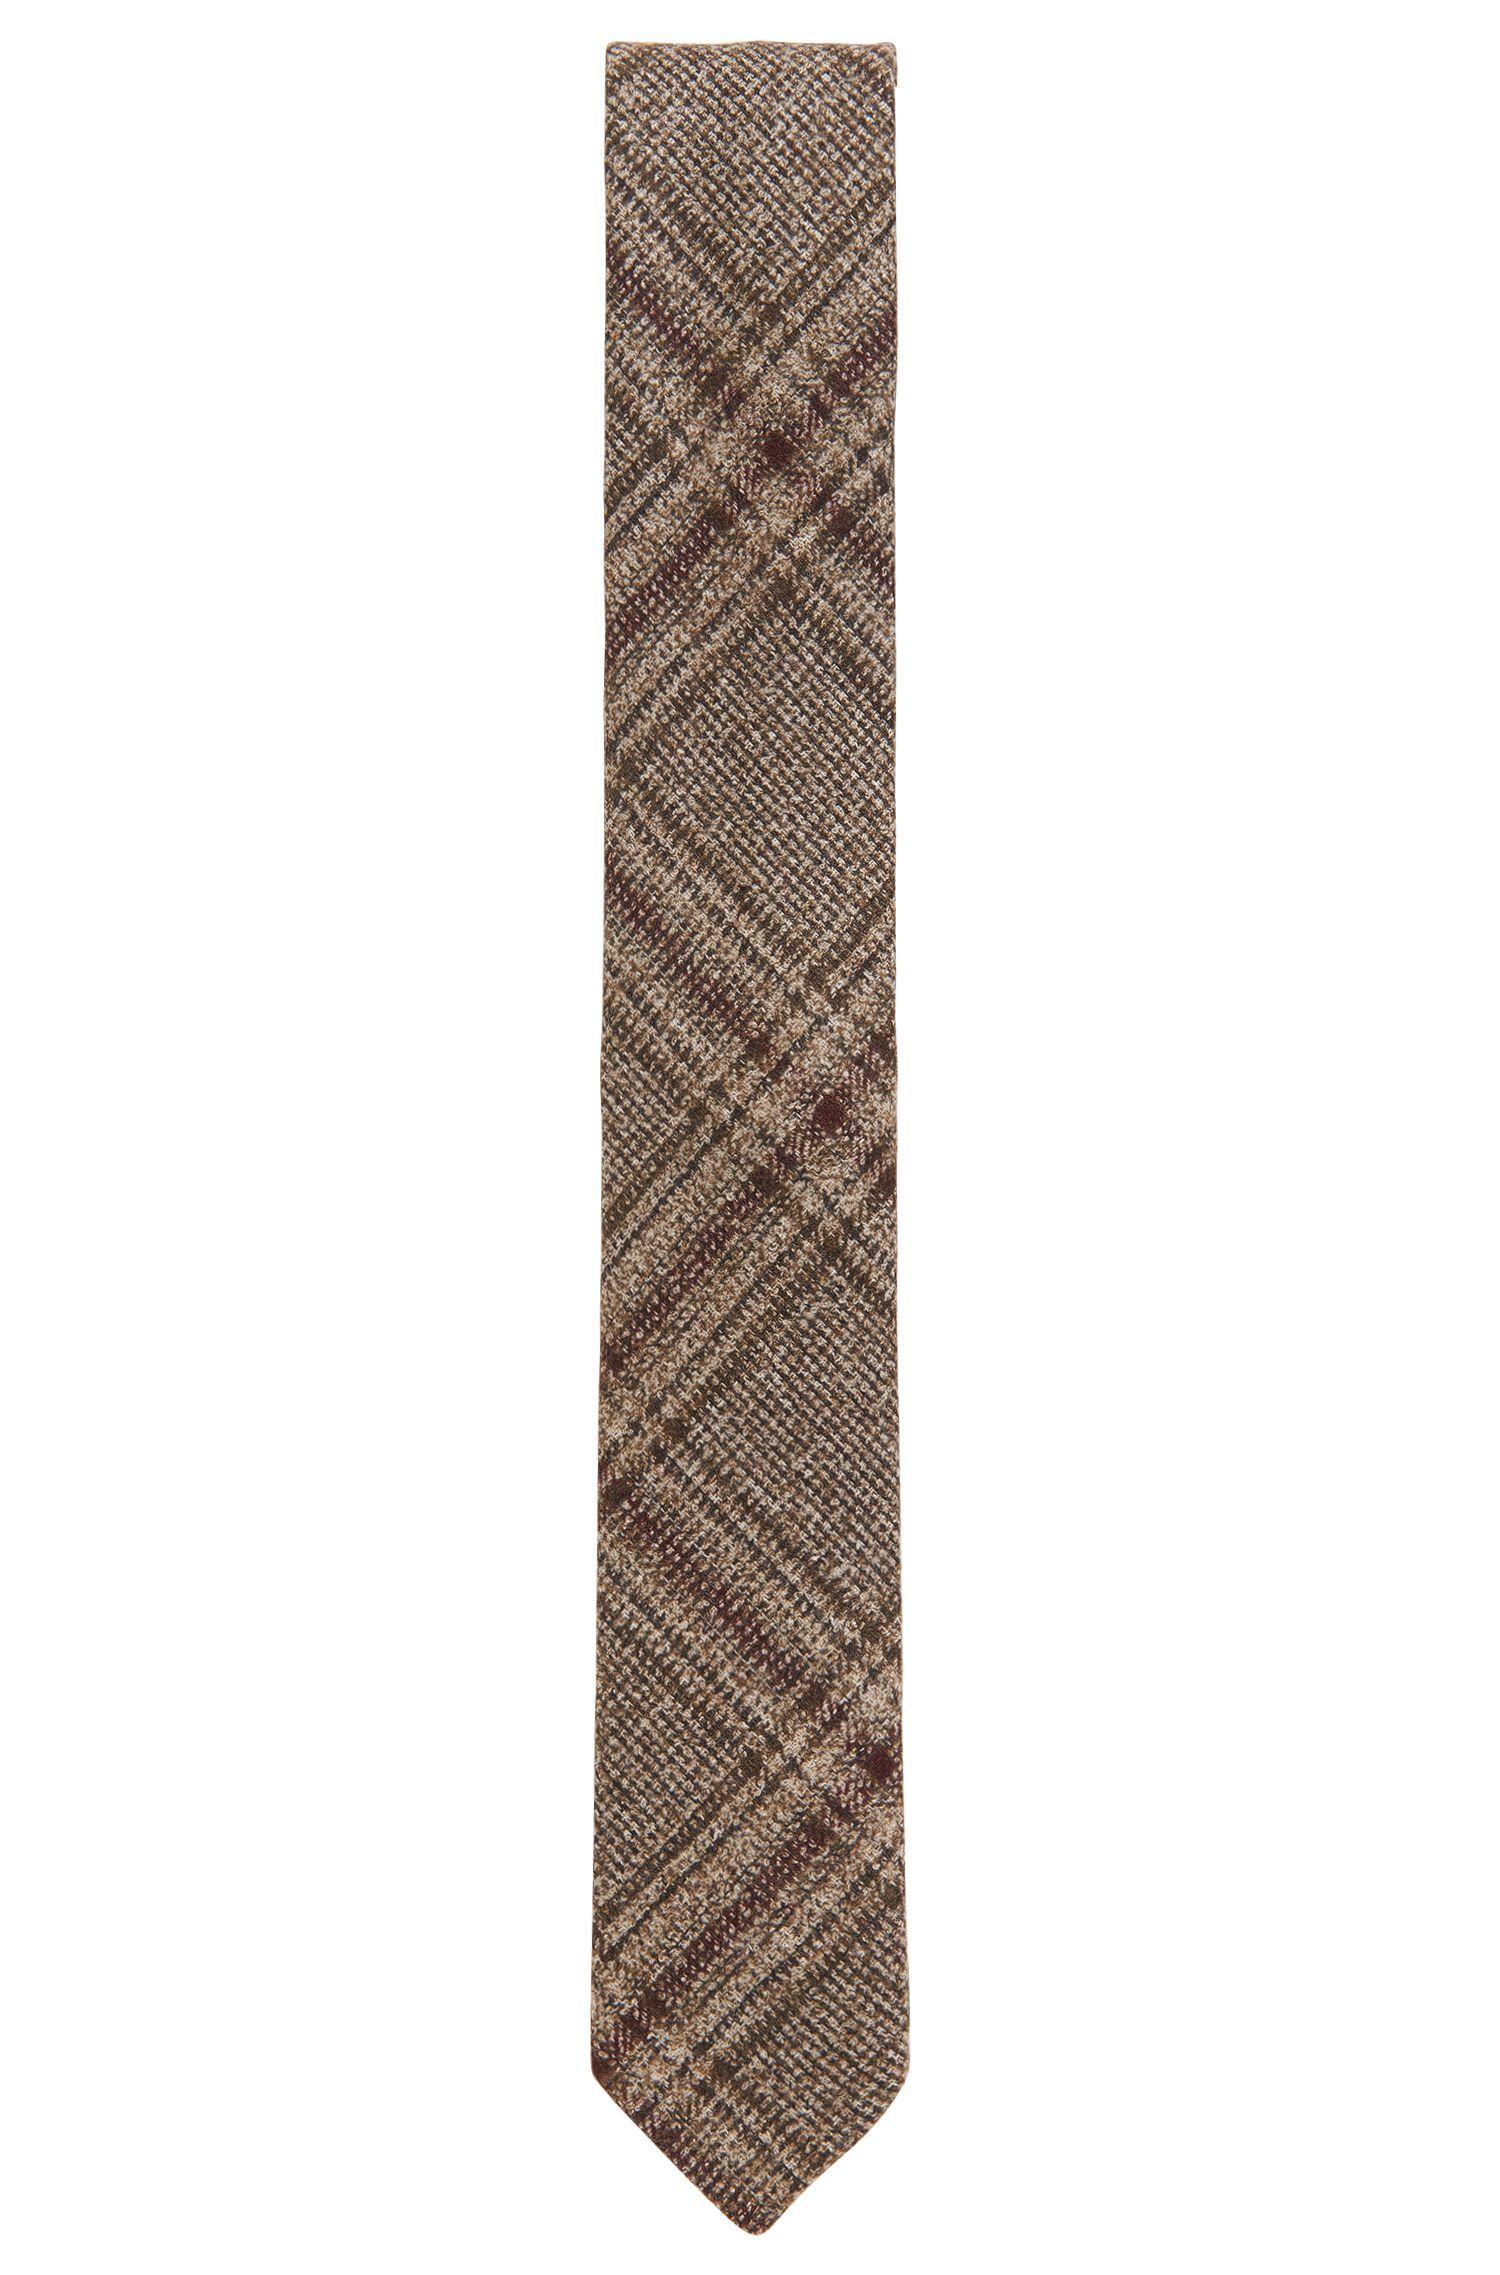 Plaid Wool Blend Tie, Slim | Tie 6 cm Soft